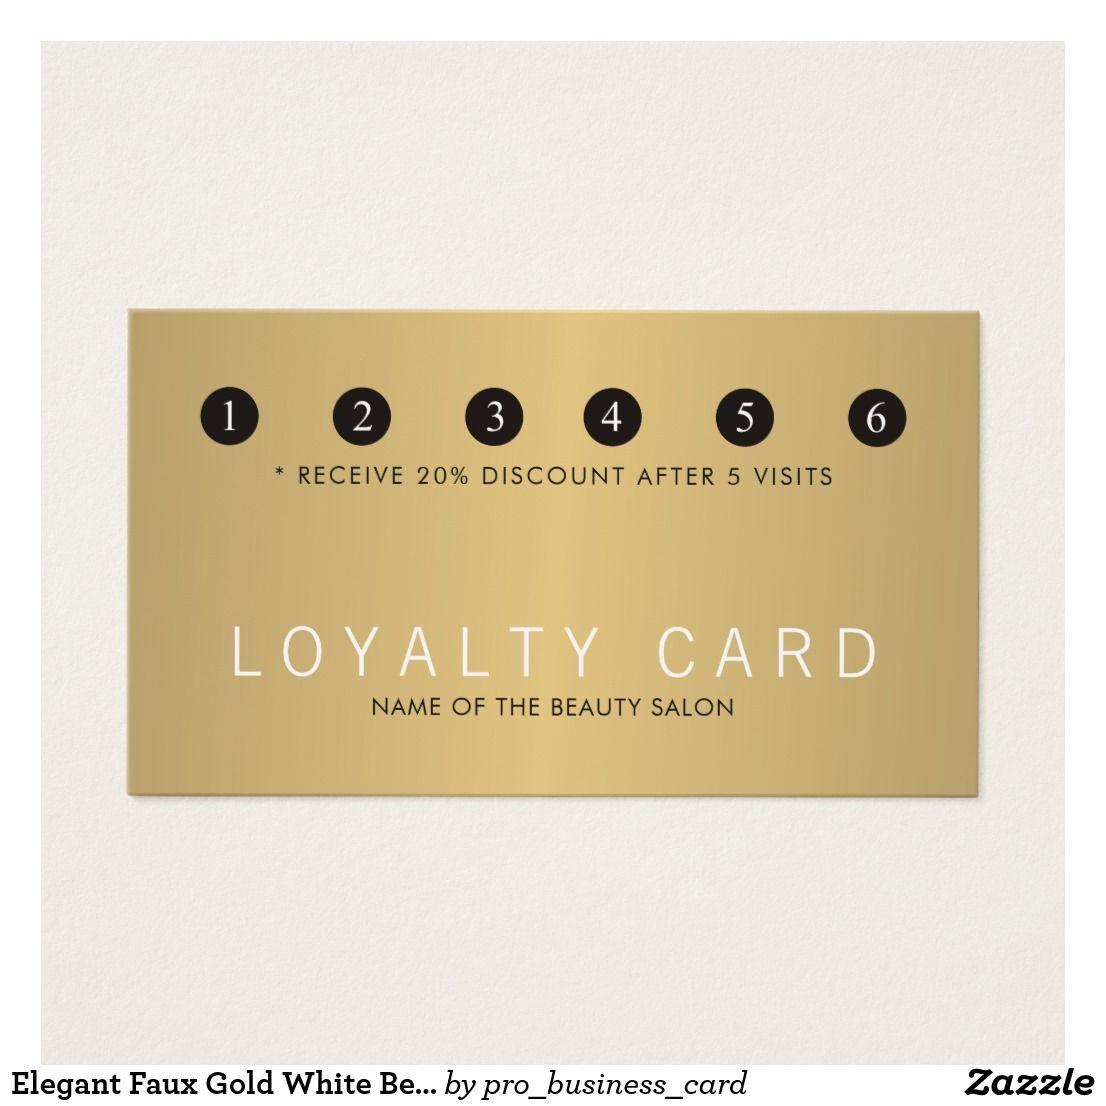 Elegant Faux Gold White Beauty Salon Loyalty  Zazzle.com